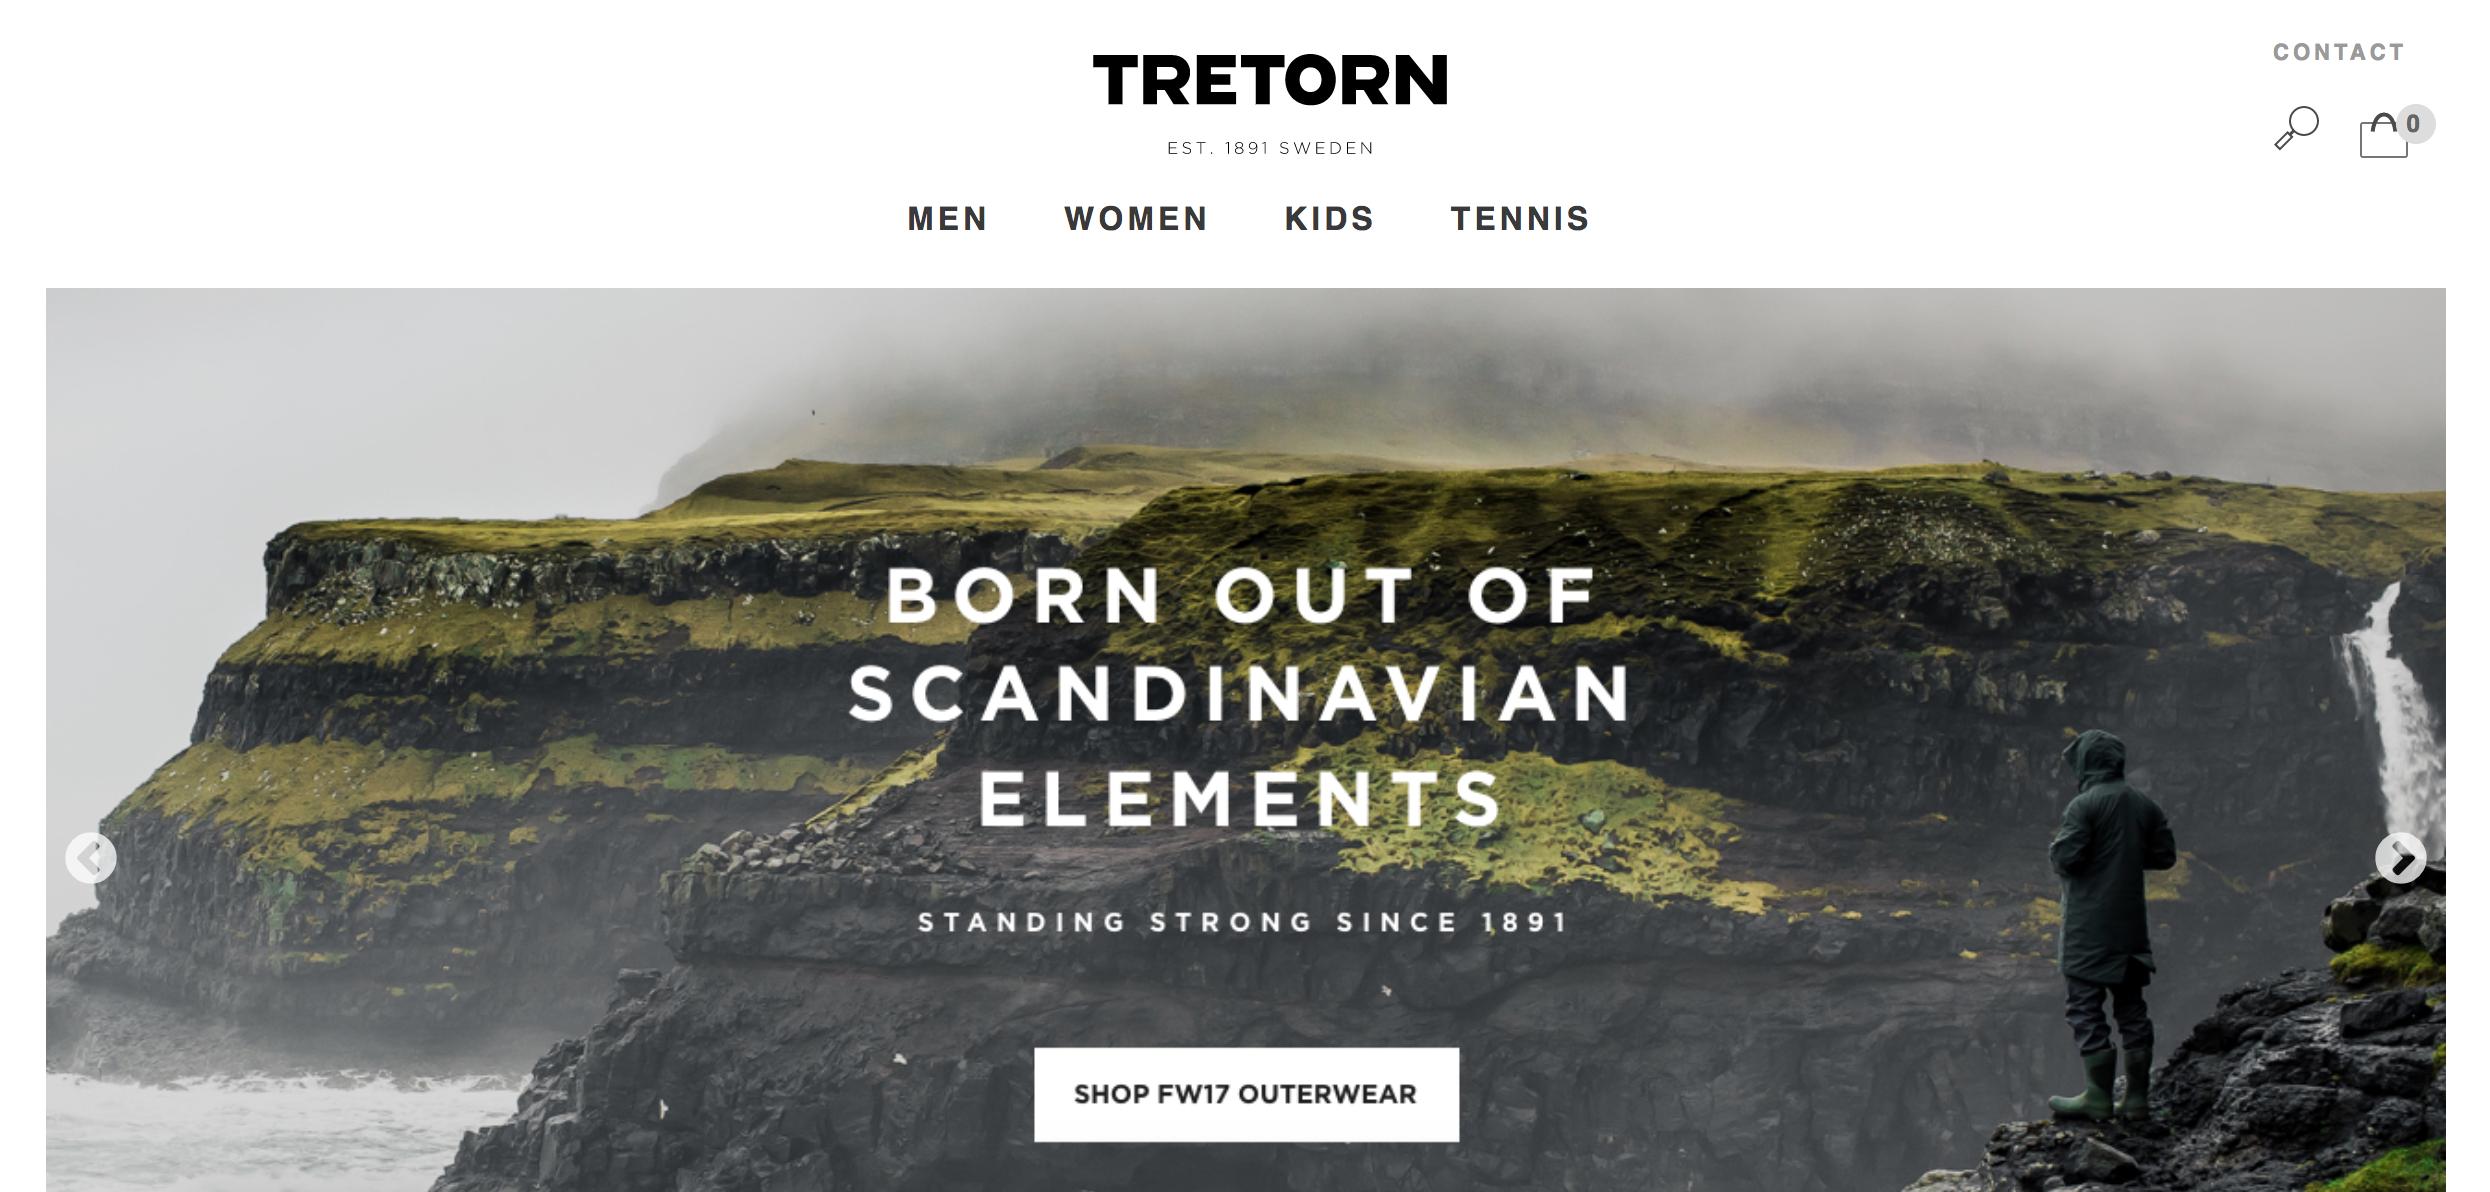 Praktikplats Tretorn